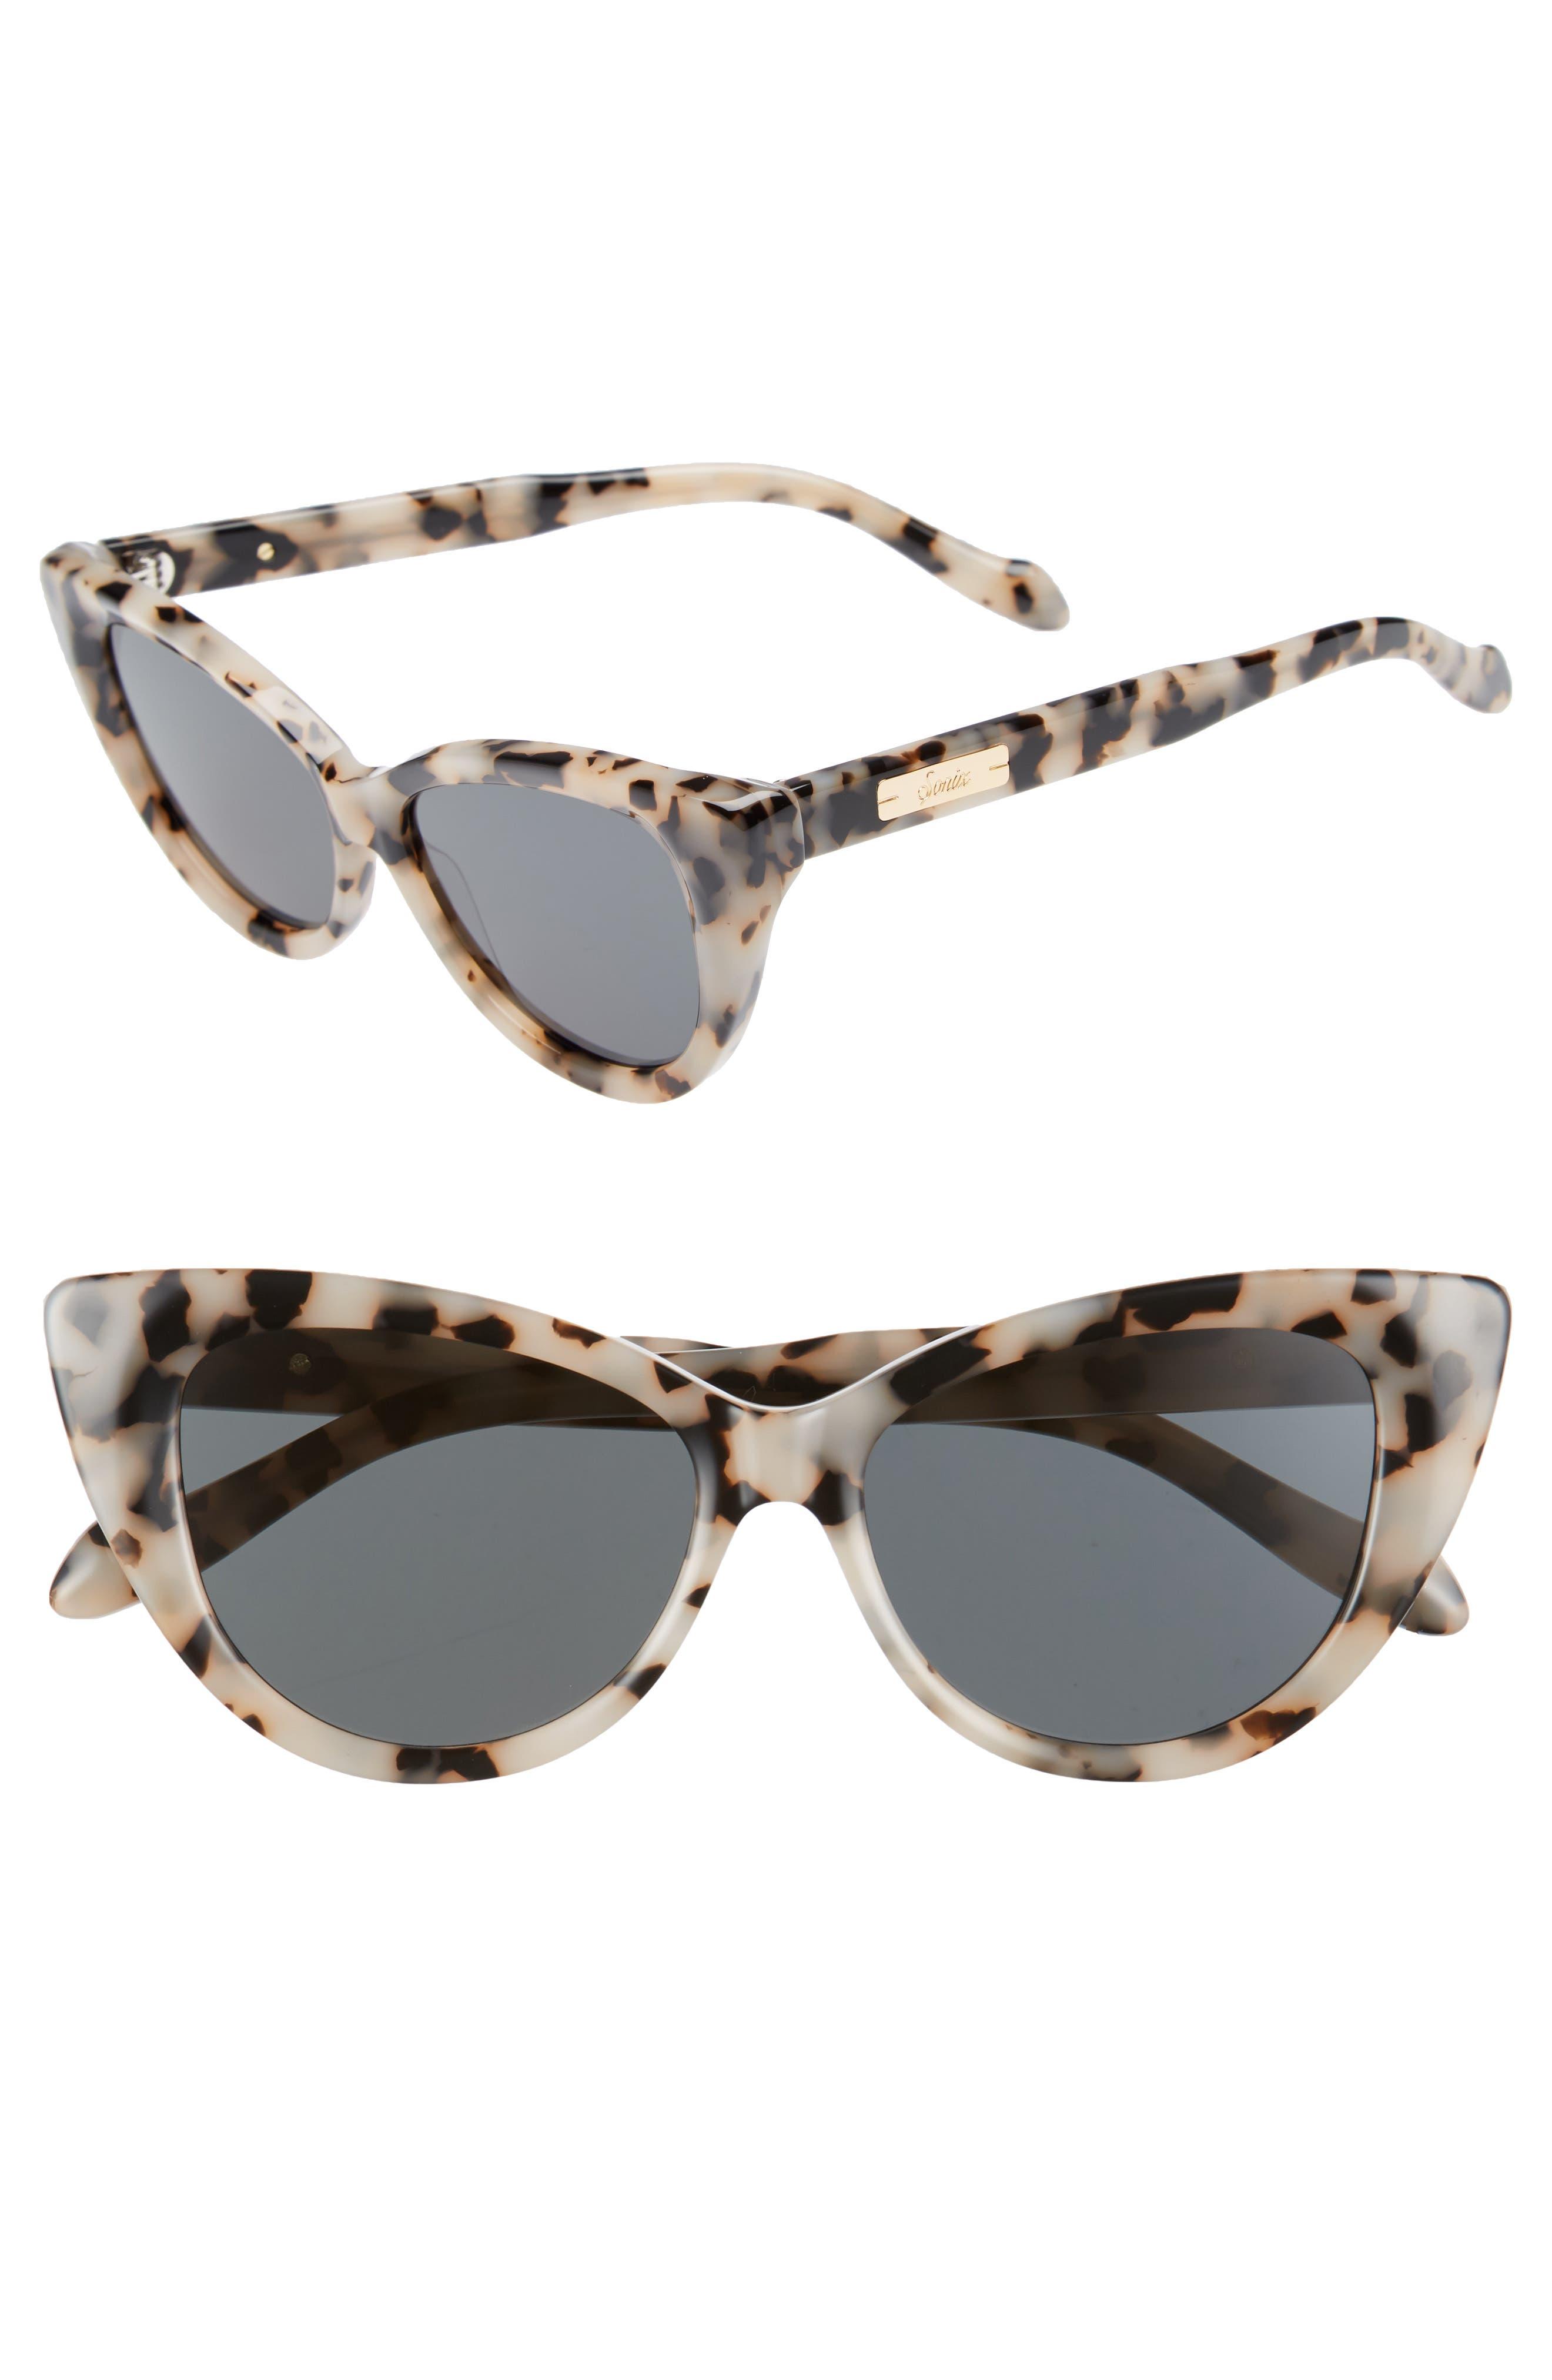 Kyoto 51mm Cat Eye Sunglasses,                         Main,                         color, Milk Tortoise/ Black Solid